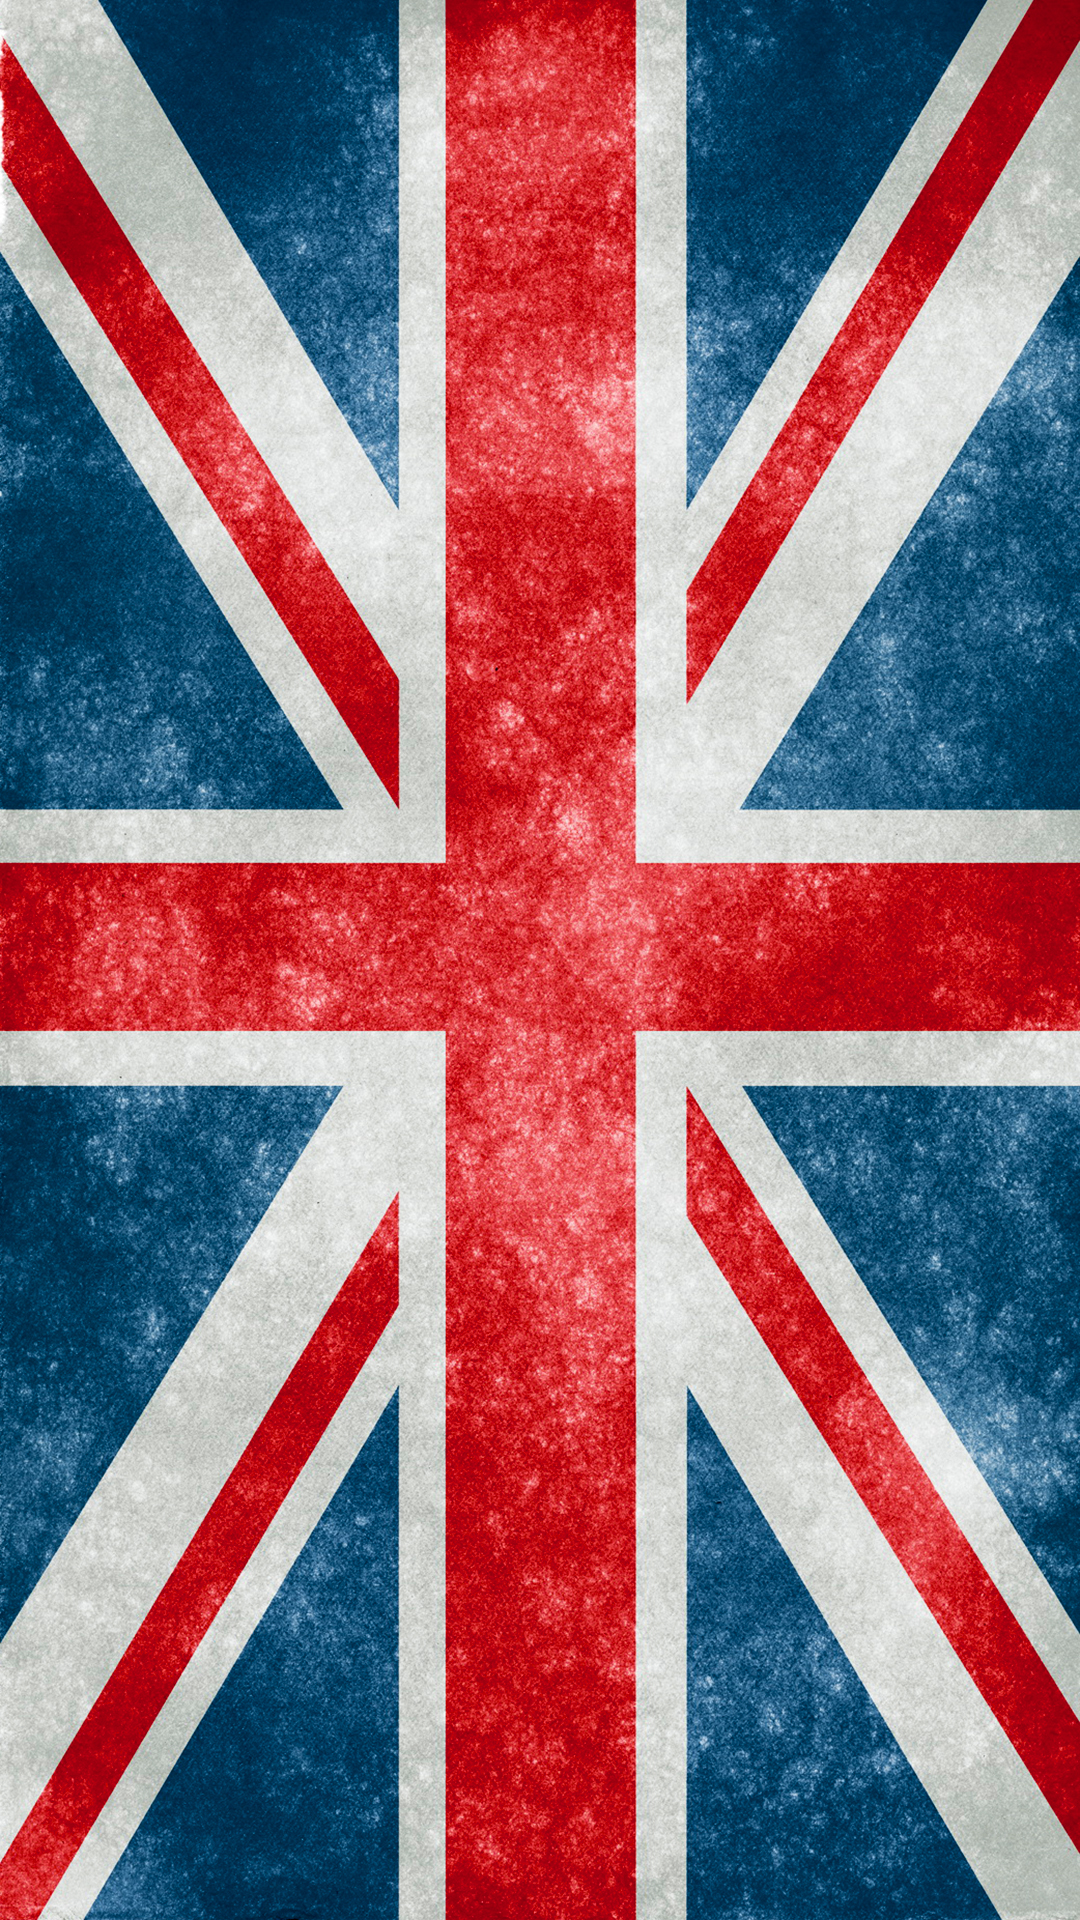 United Kingdom Flag htc one wallpaper   Best htc one 1080x1920